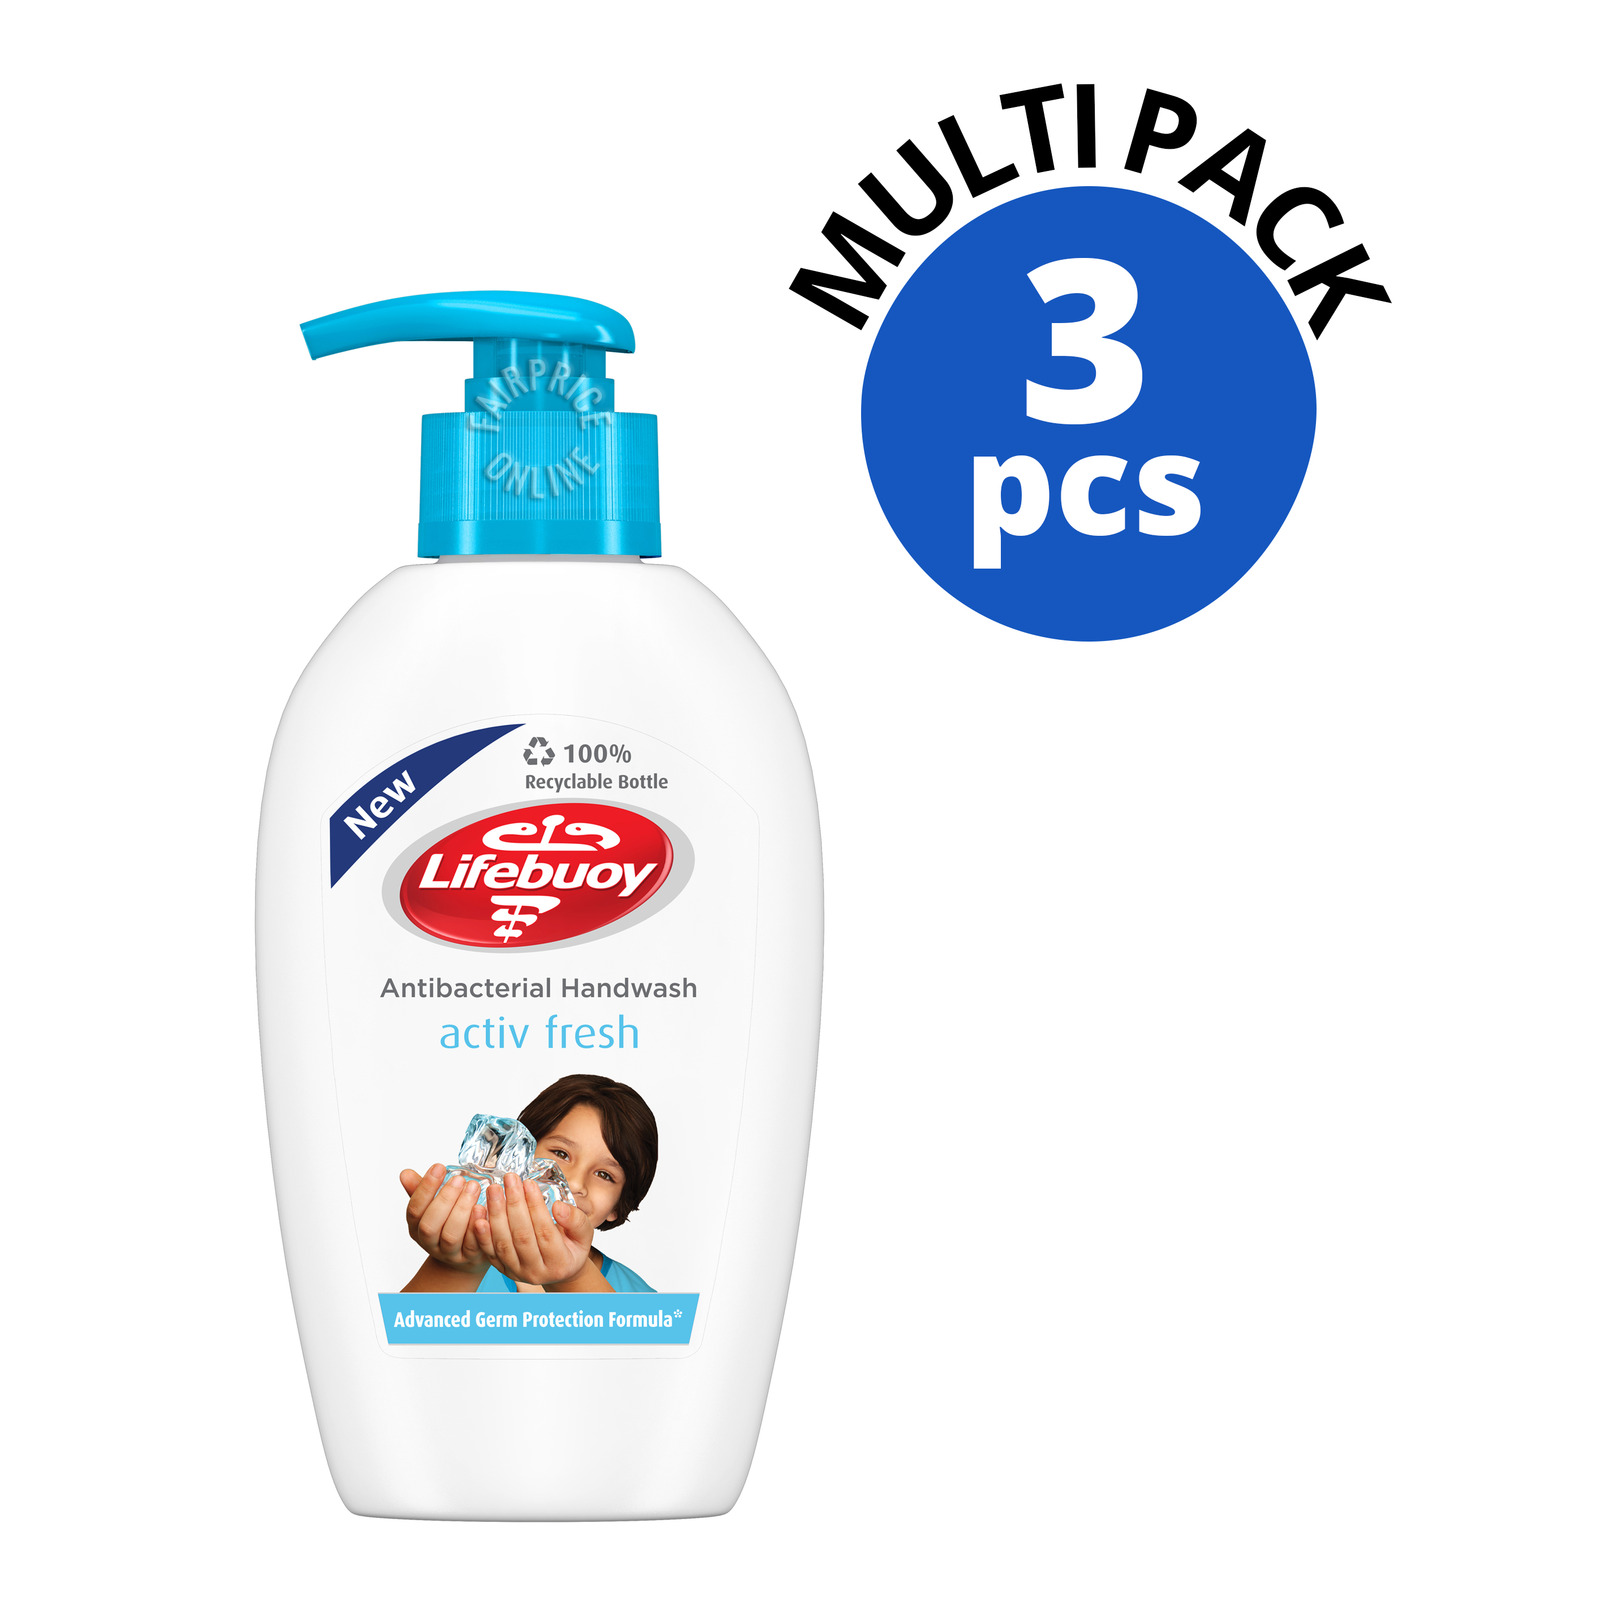 Lifebuoy Antibacterial Hand Wash - Activ Fresh